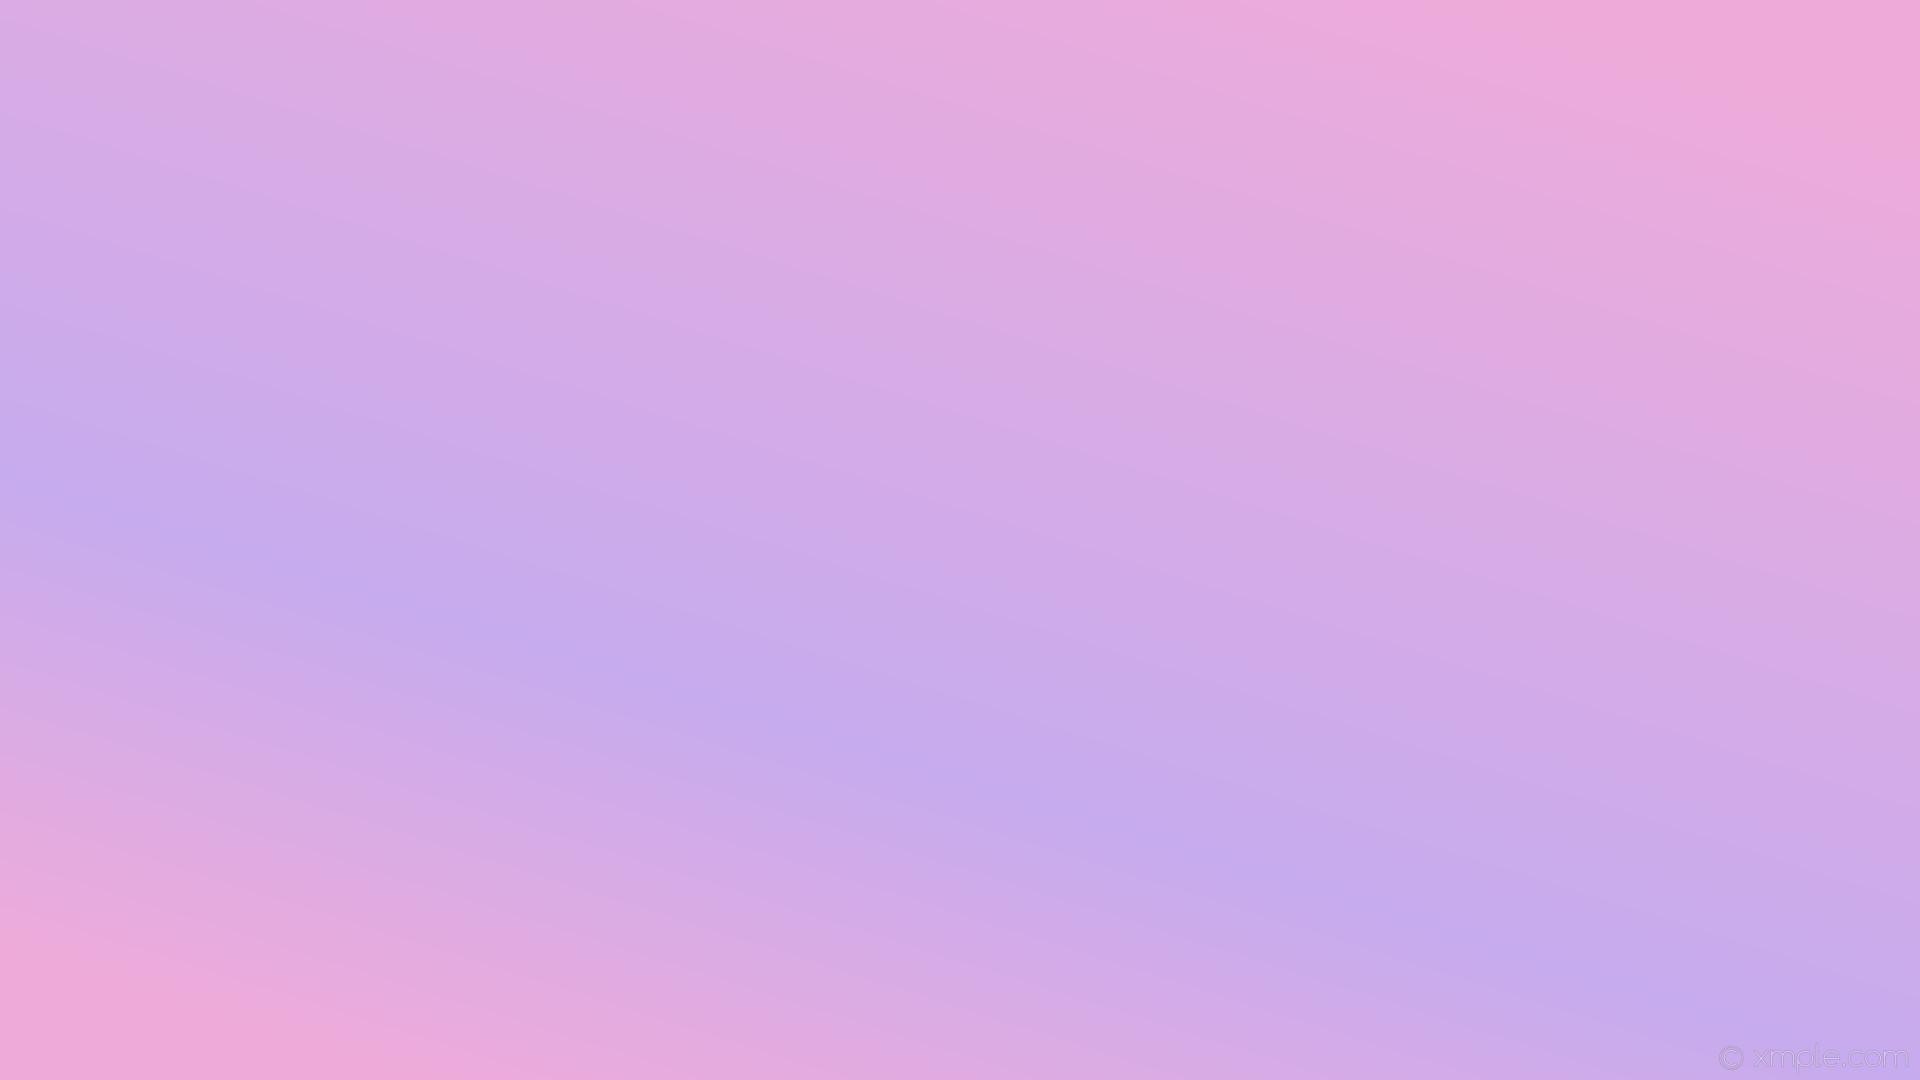 1920x1080 Pink And Black Backgrounds For Desktop Wallpaper